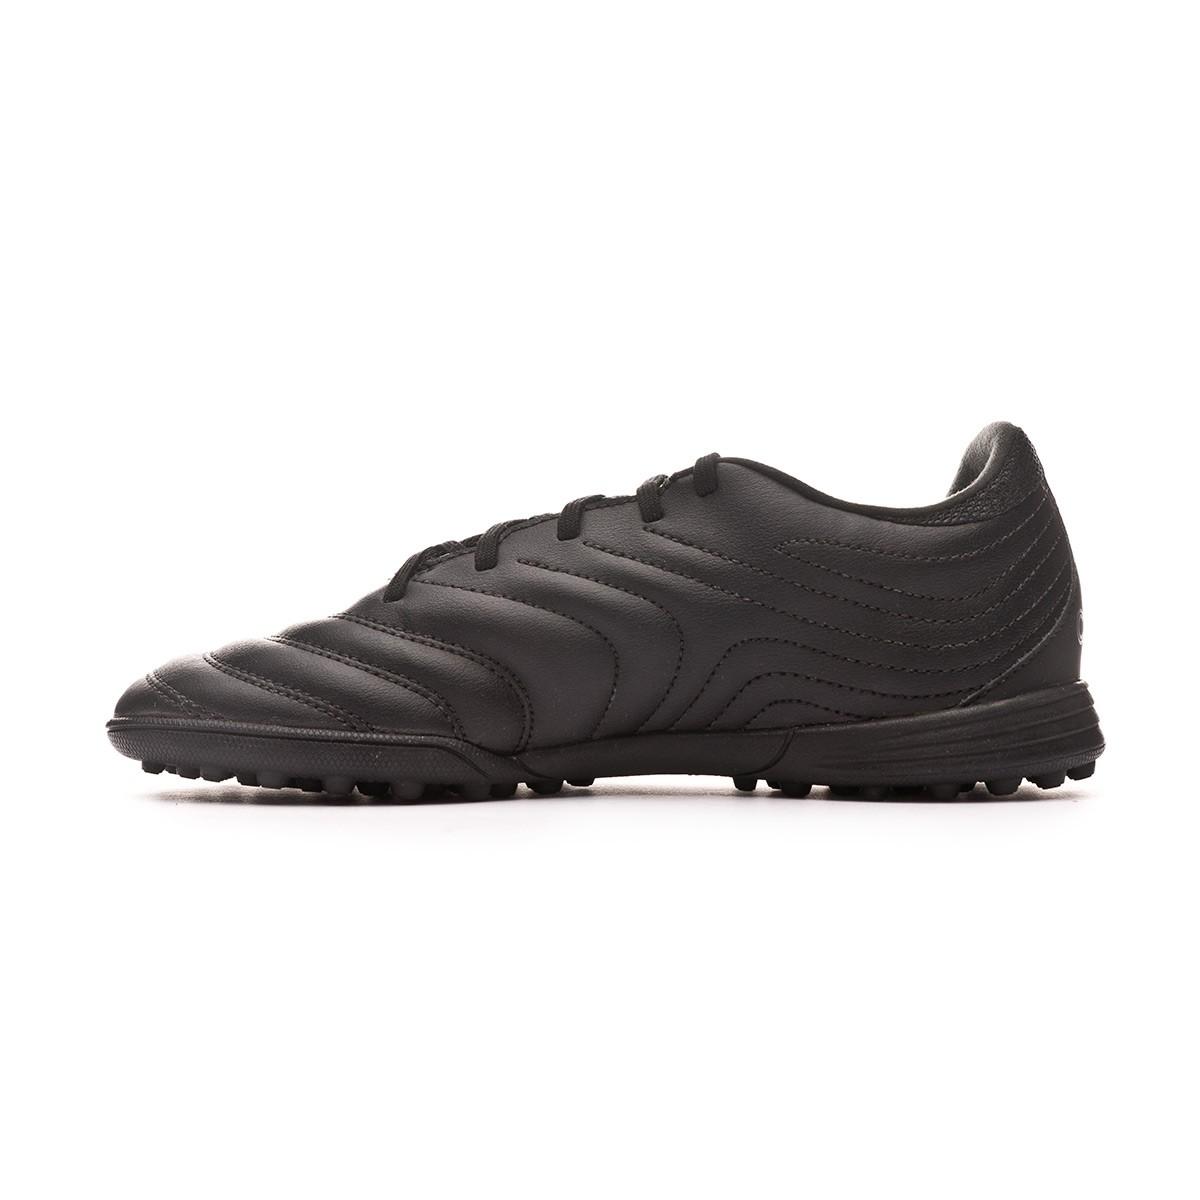 d0093a387404 Football Boot adidas Kids Copa Tango 19.3 Turf Core black-Grey six - Leaked  soccer